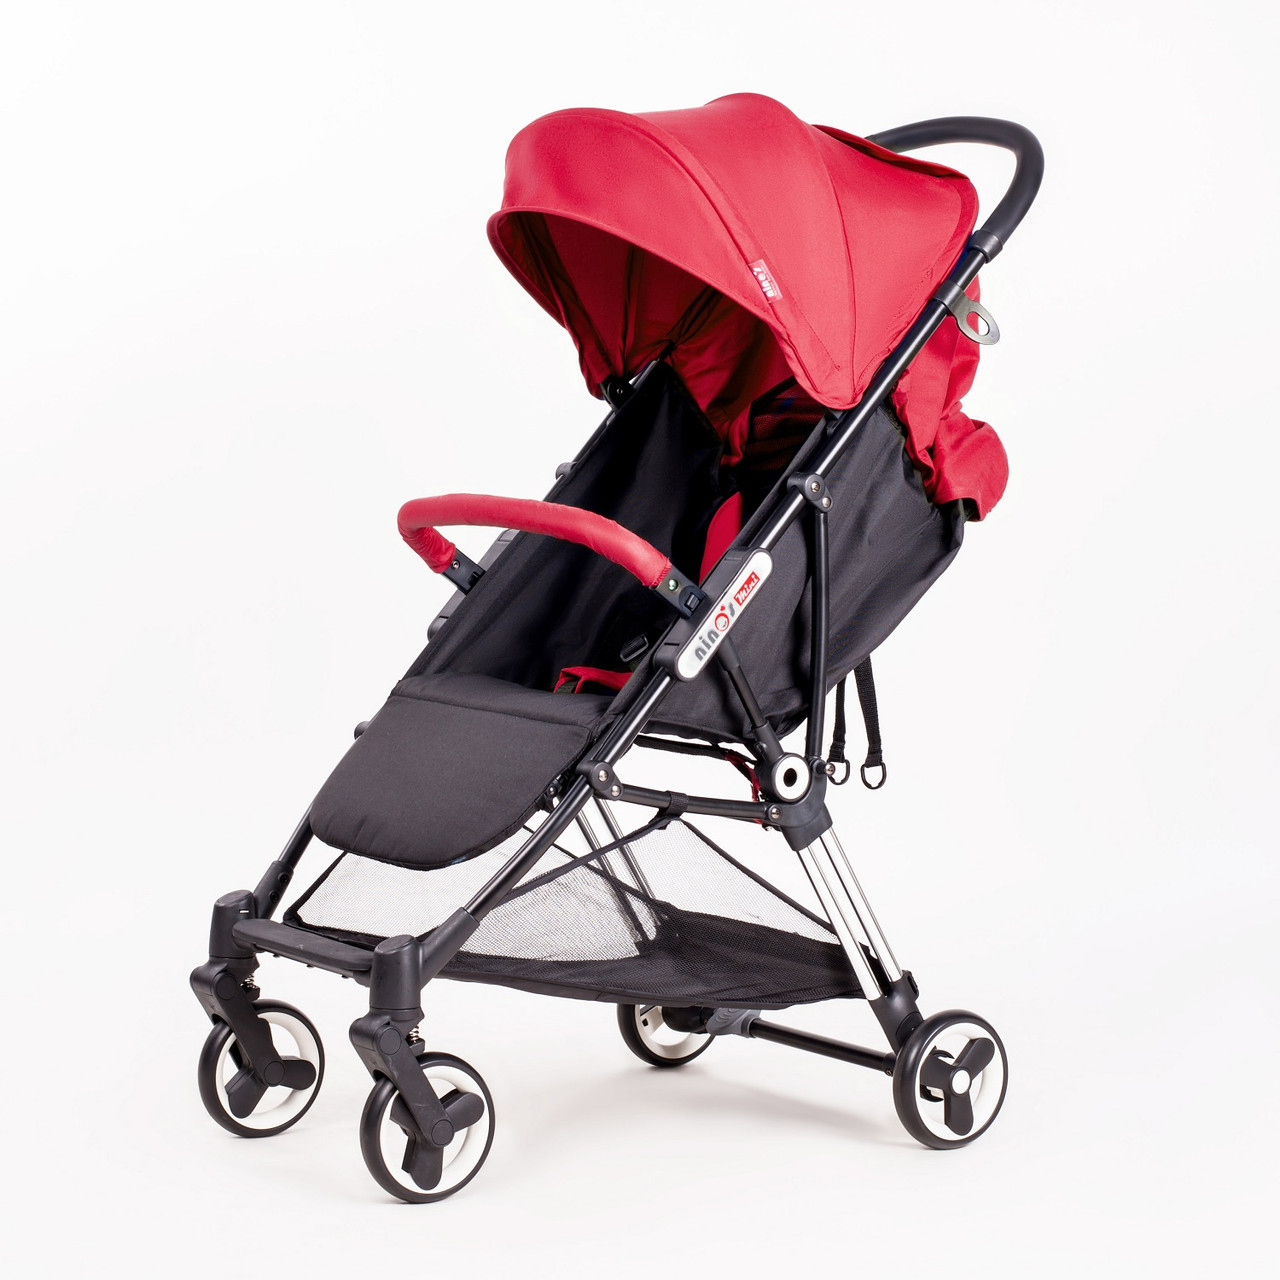 Прогулочная коляска Ninos Mini Red 5,8 кг